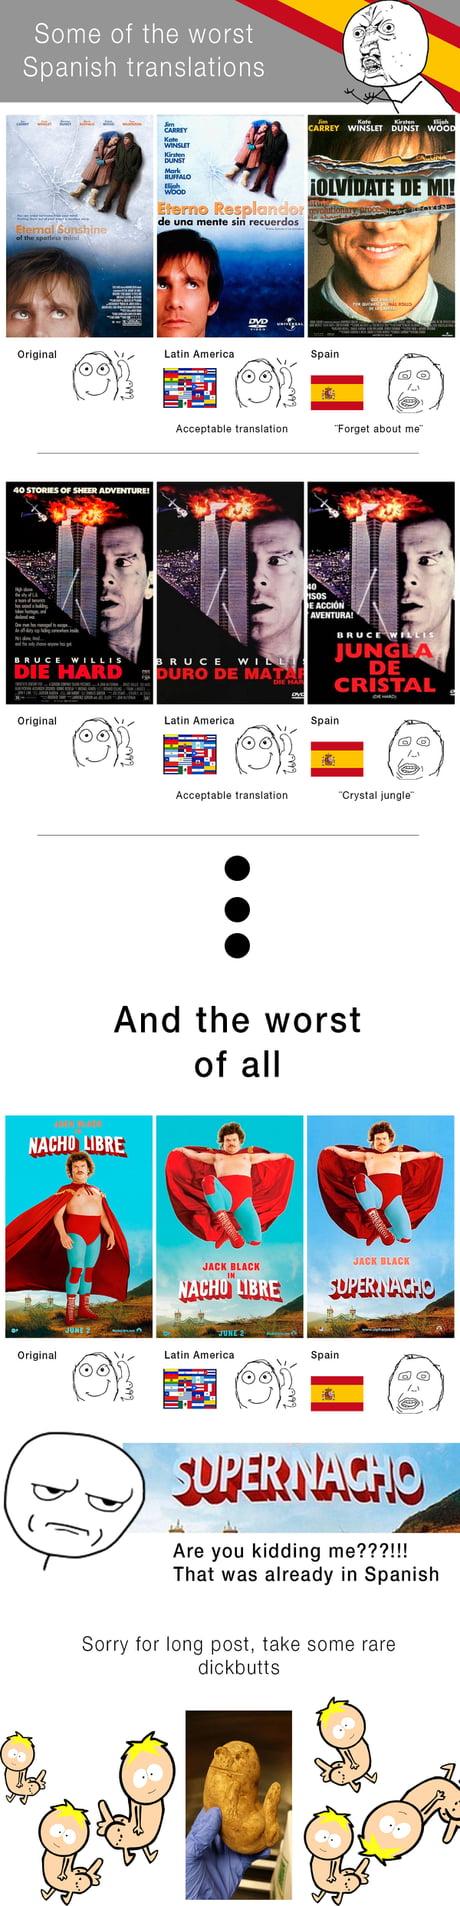 spanish title translations